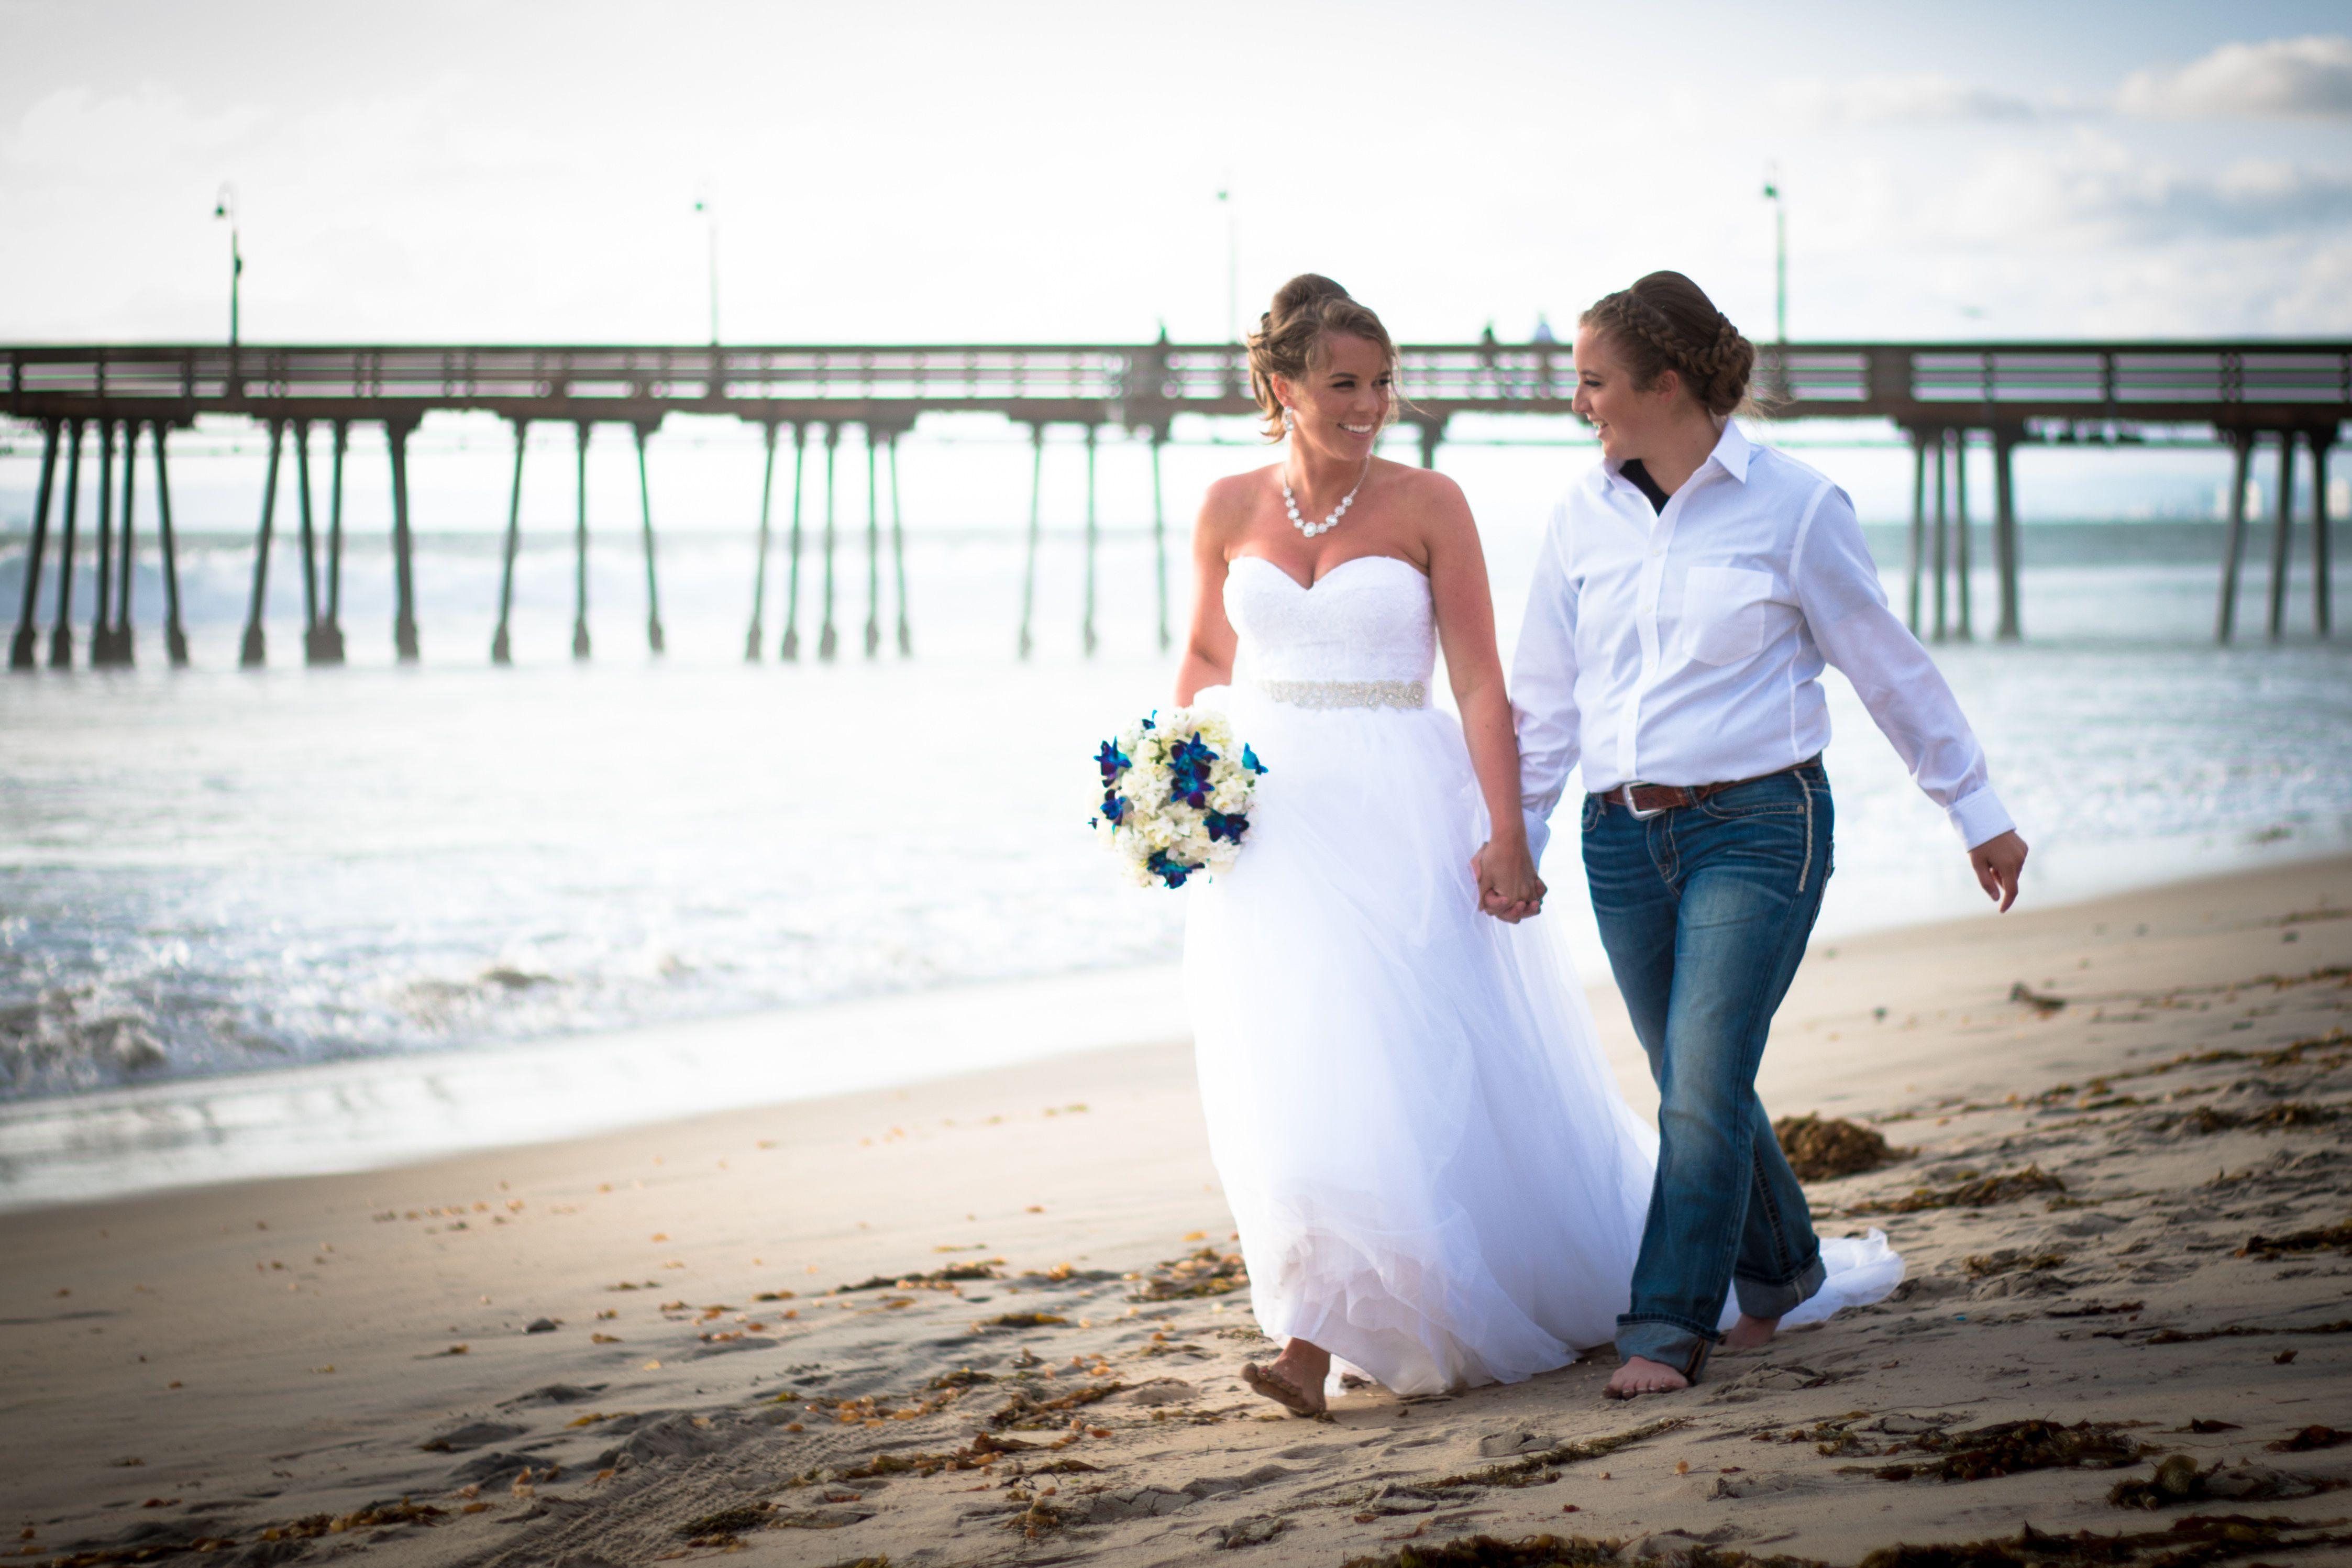 Pin By Dream Beach Wedding San Dieg On Lgbtq Weddings By Dream Beach Wedding San Diego Wedding Venues Dream Beach Wedding Lgbtq Wedding